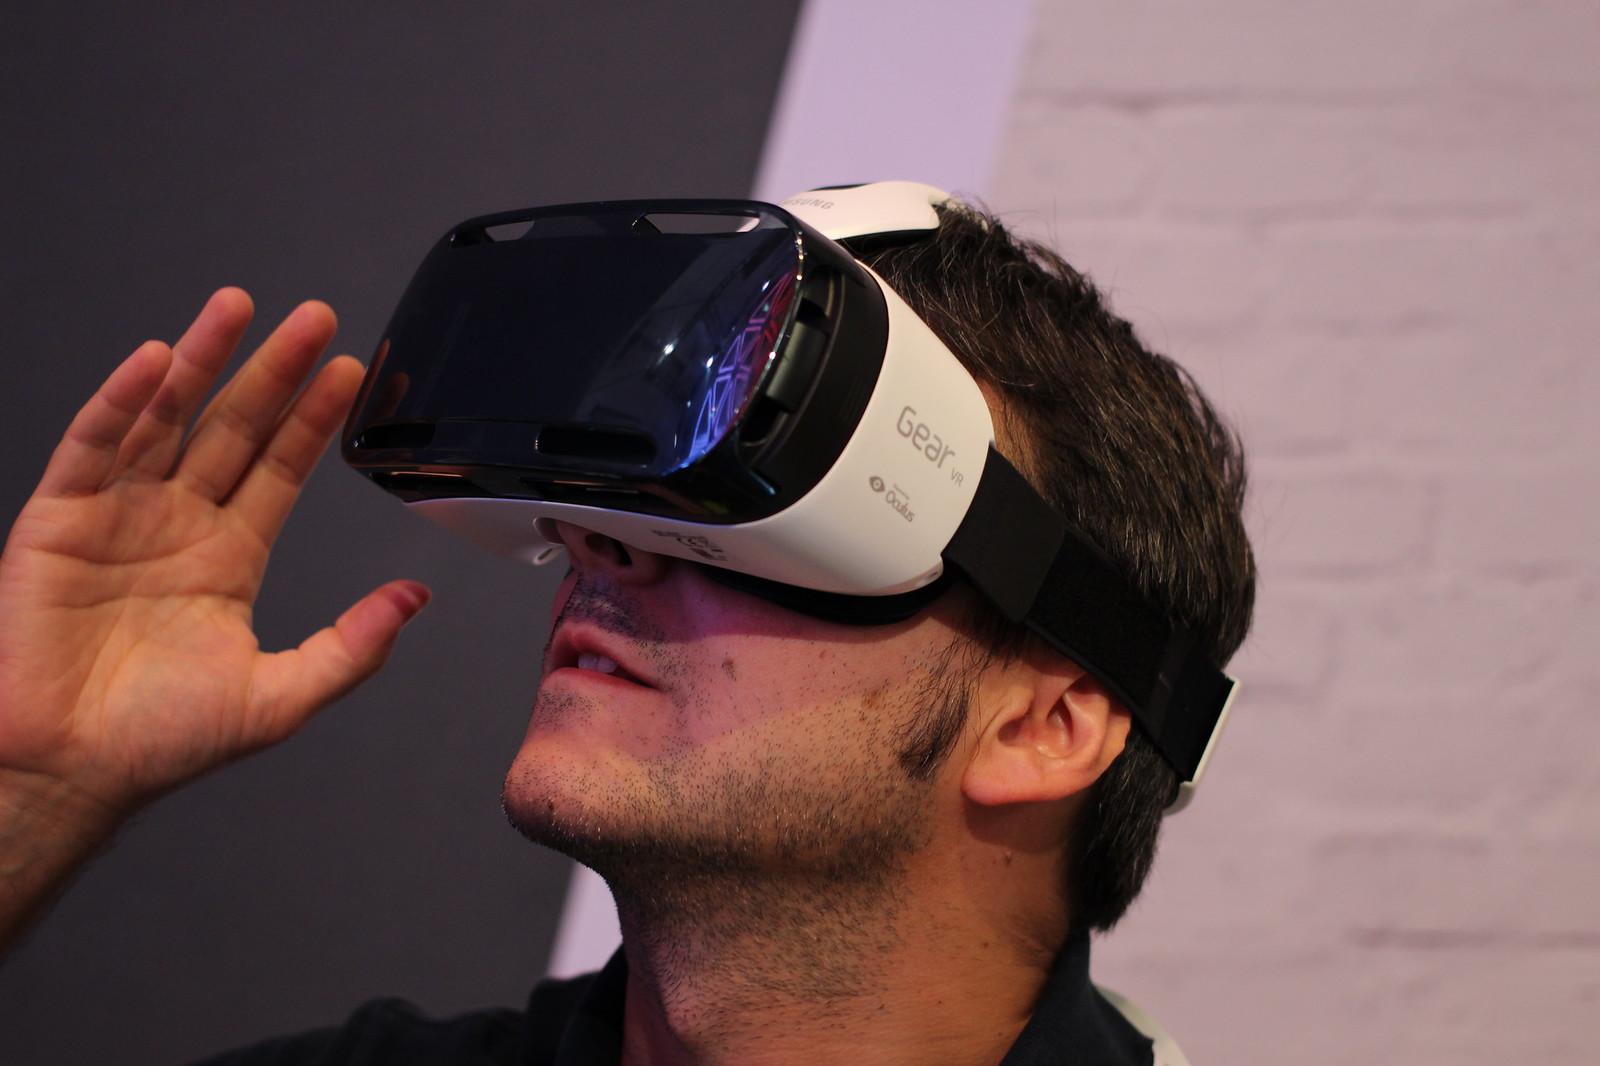 A man wearing a Gear VR headset